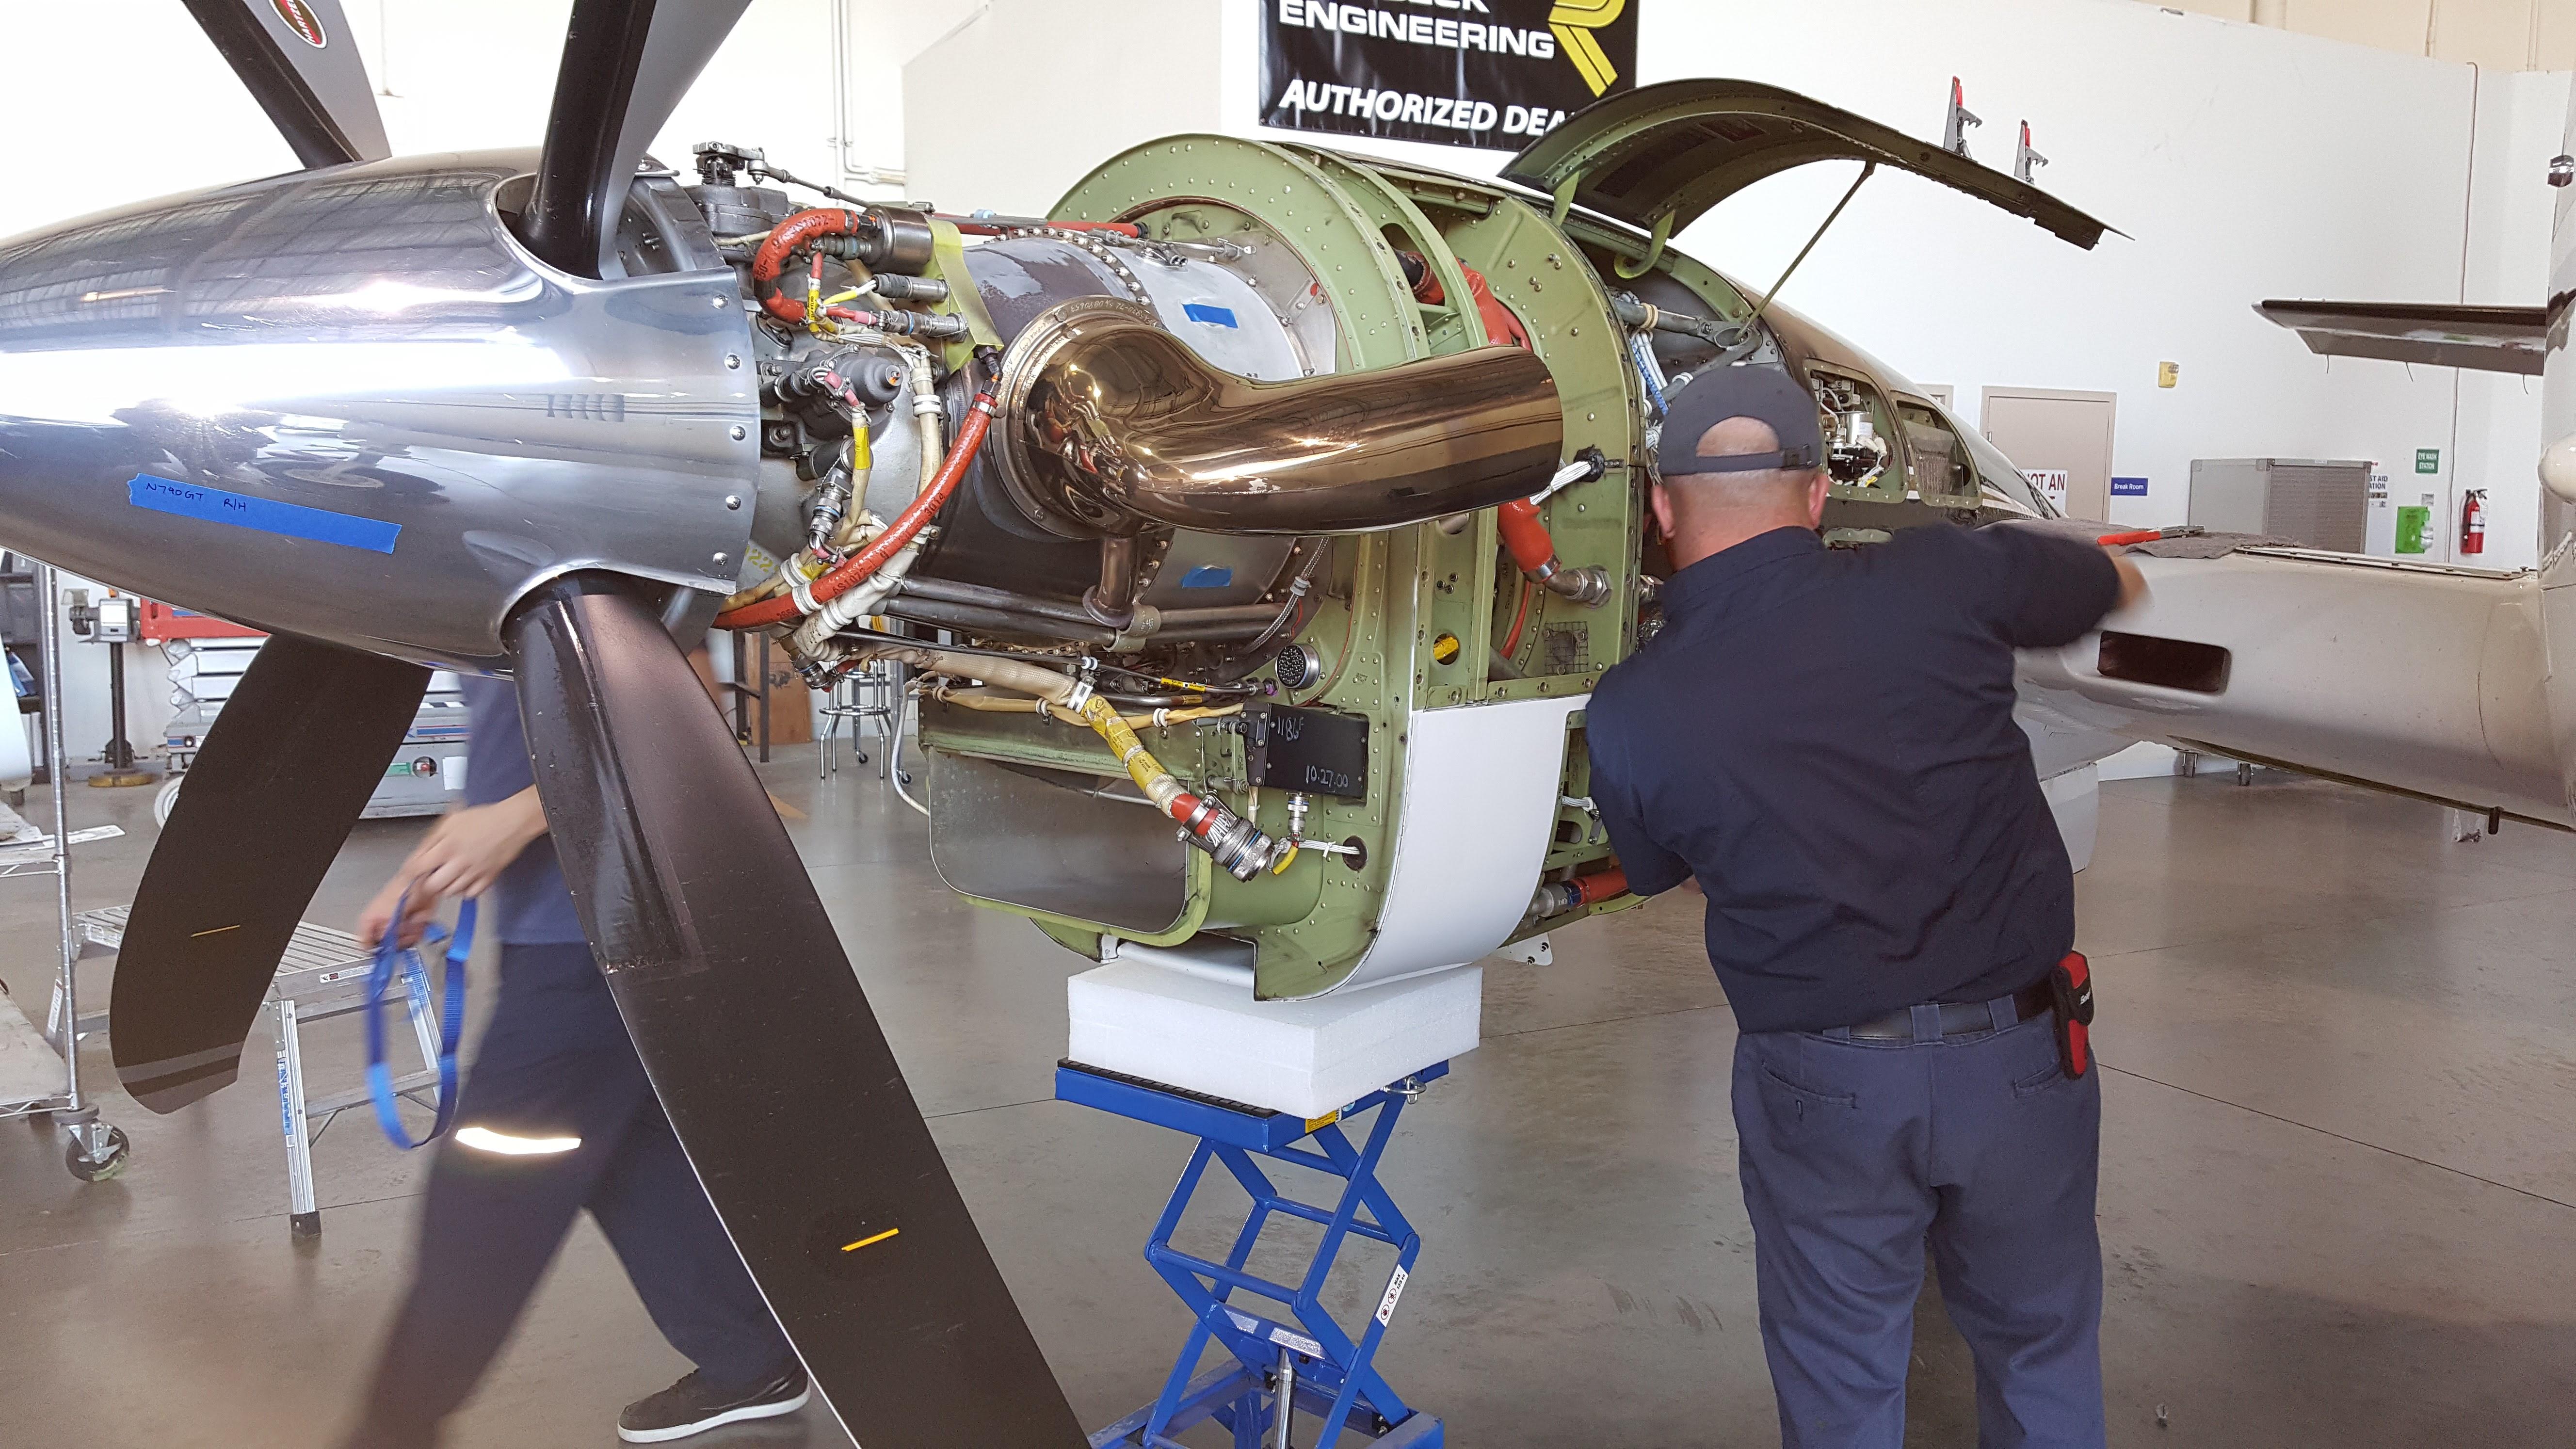 Apex Aviation image 9